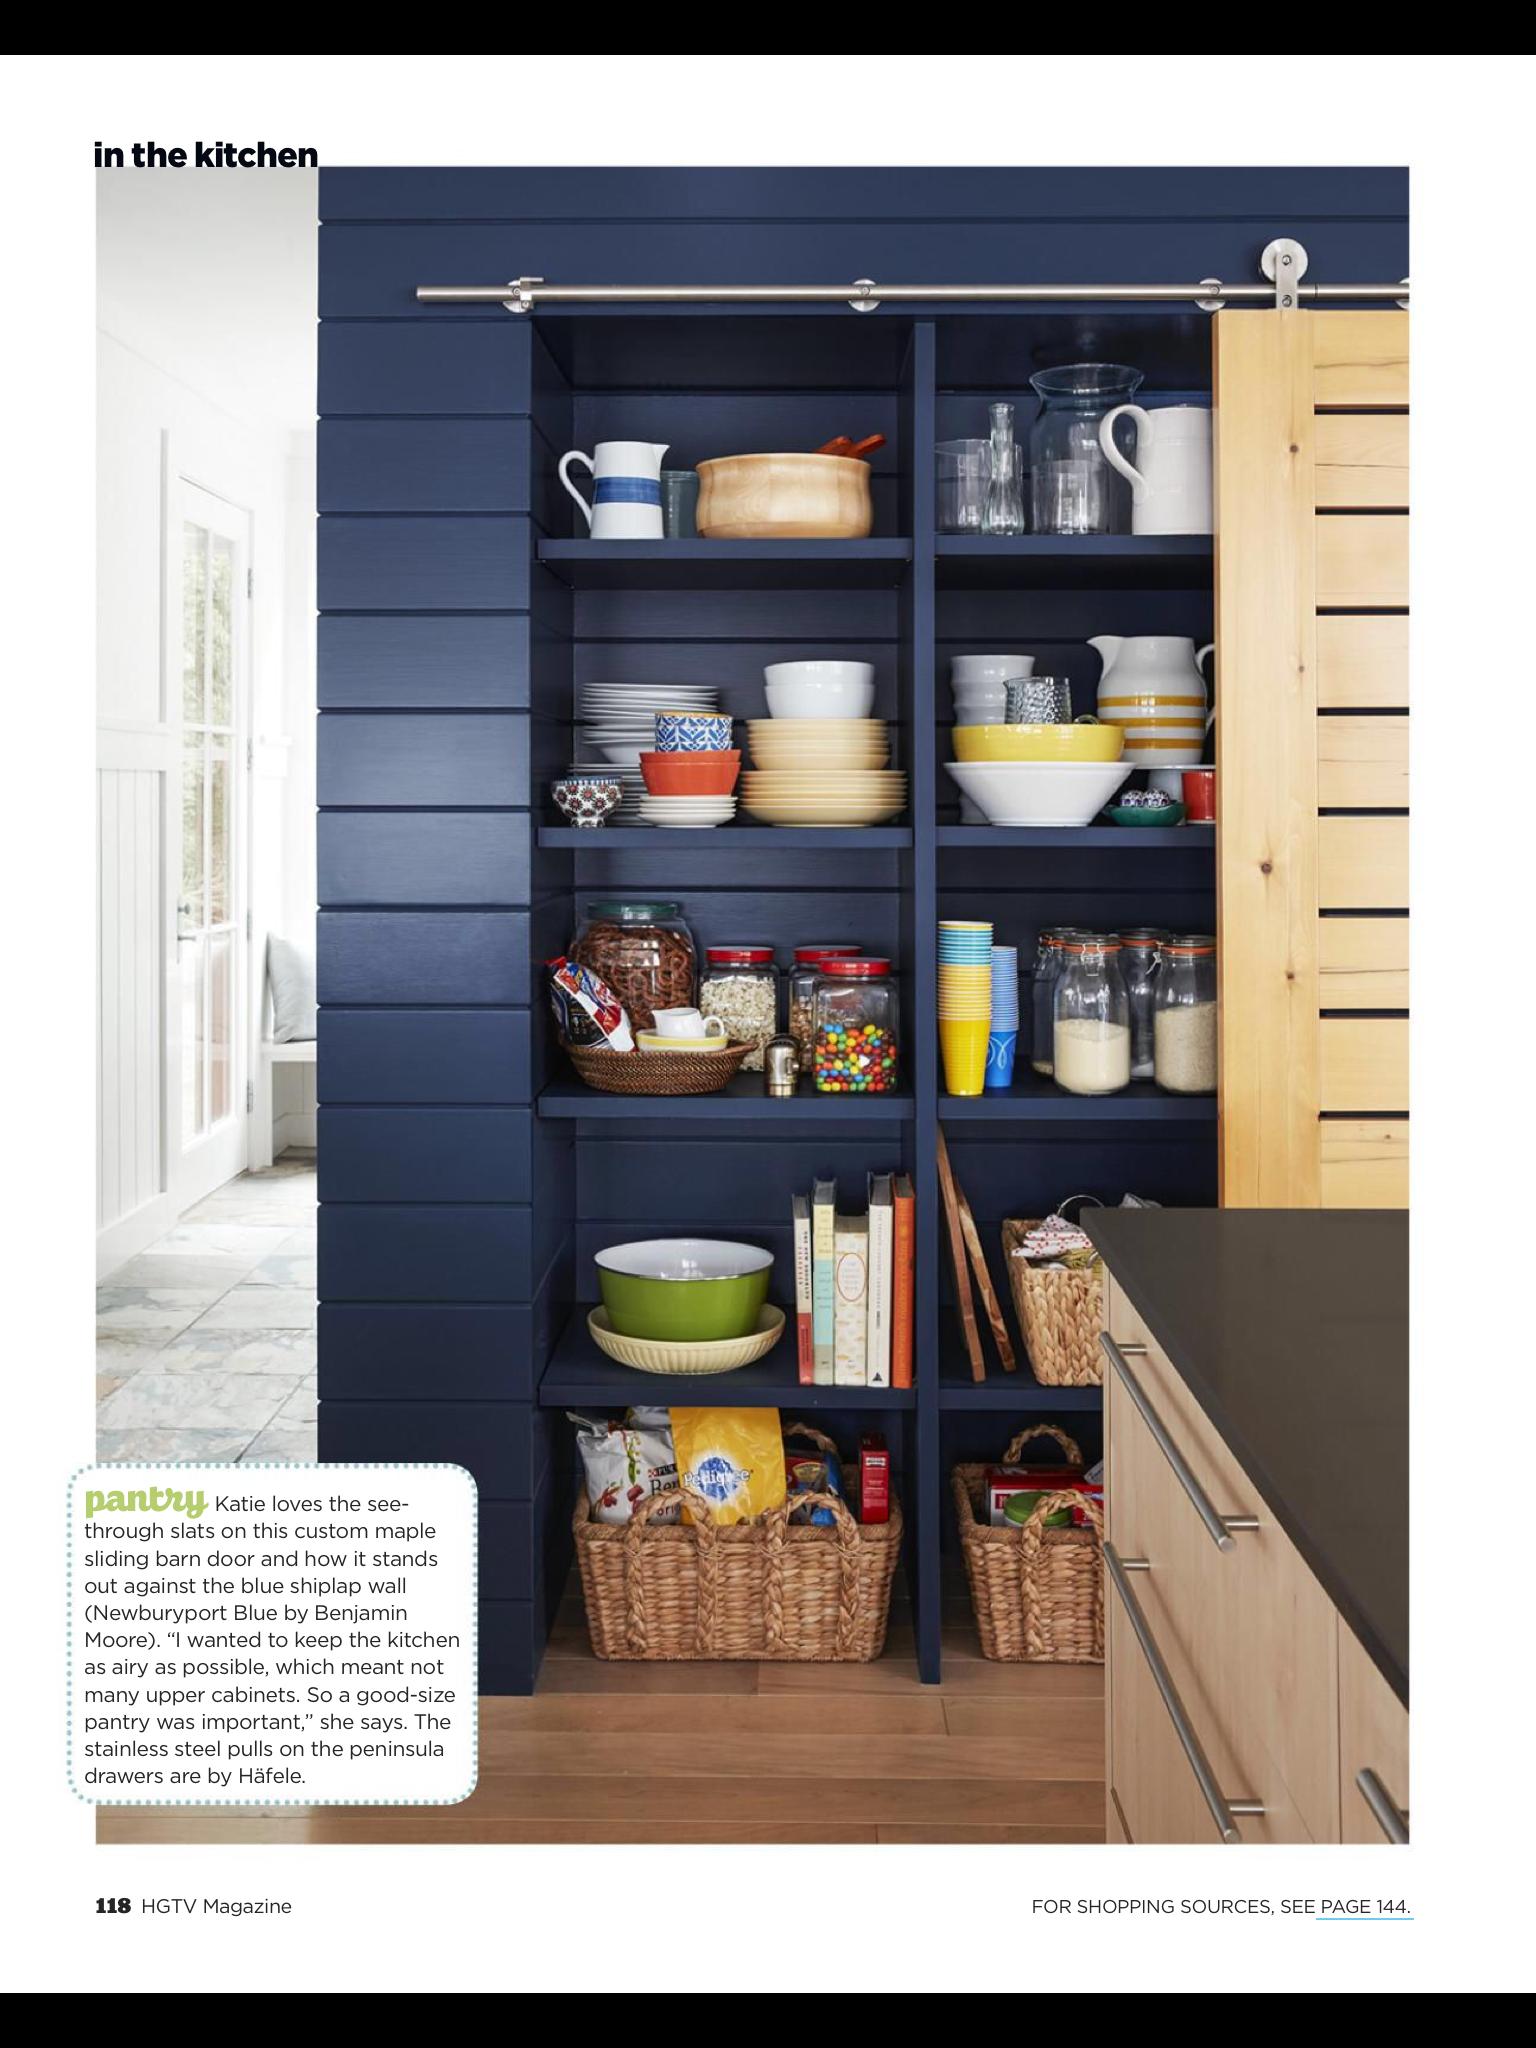 Pin By H Warner On Living Room Update Lemon Kitchen Decor Small Kitchen Decor Clean Kitchen Design